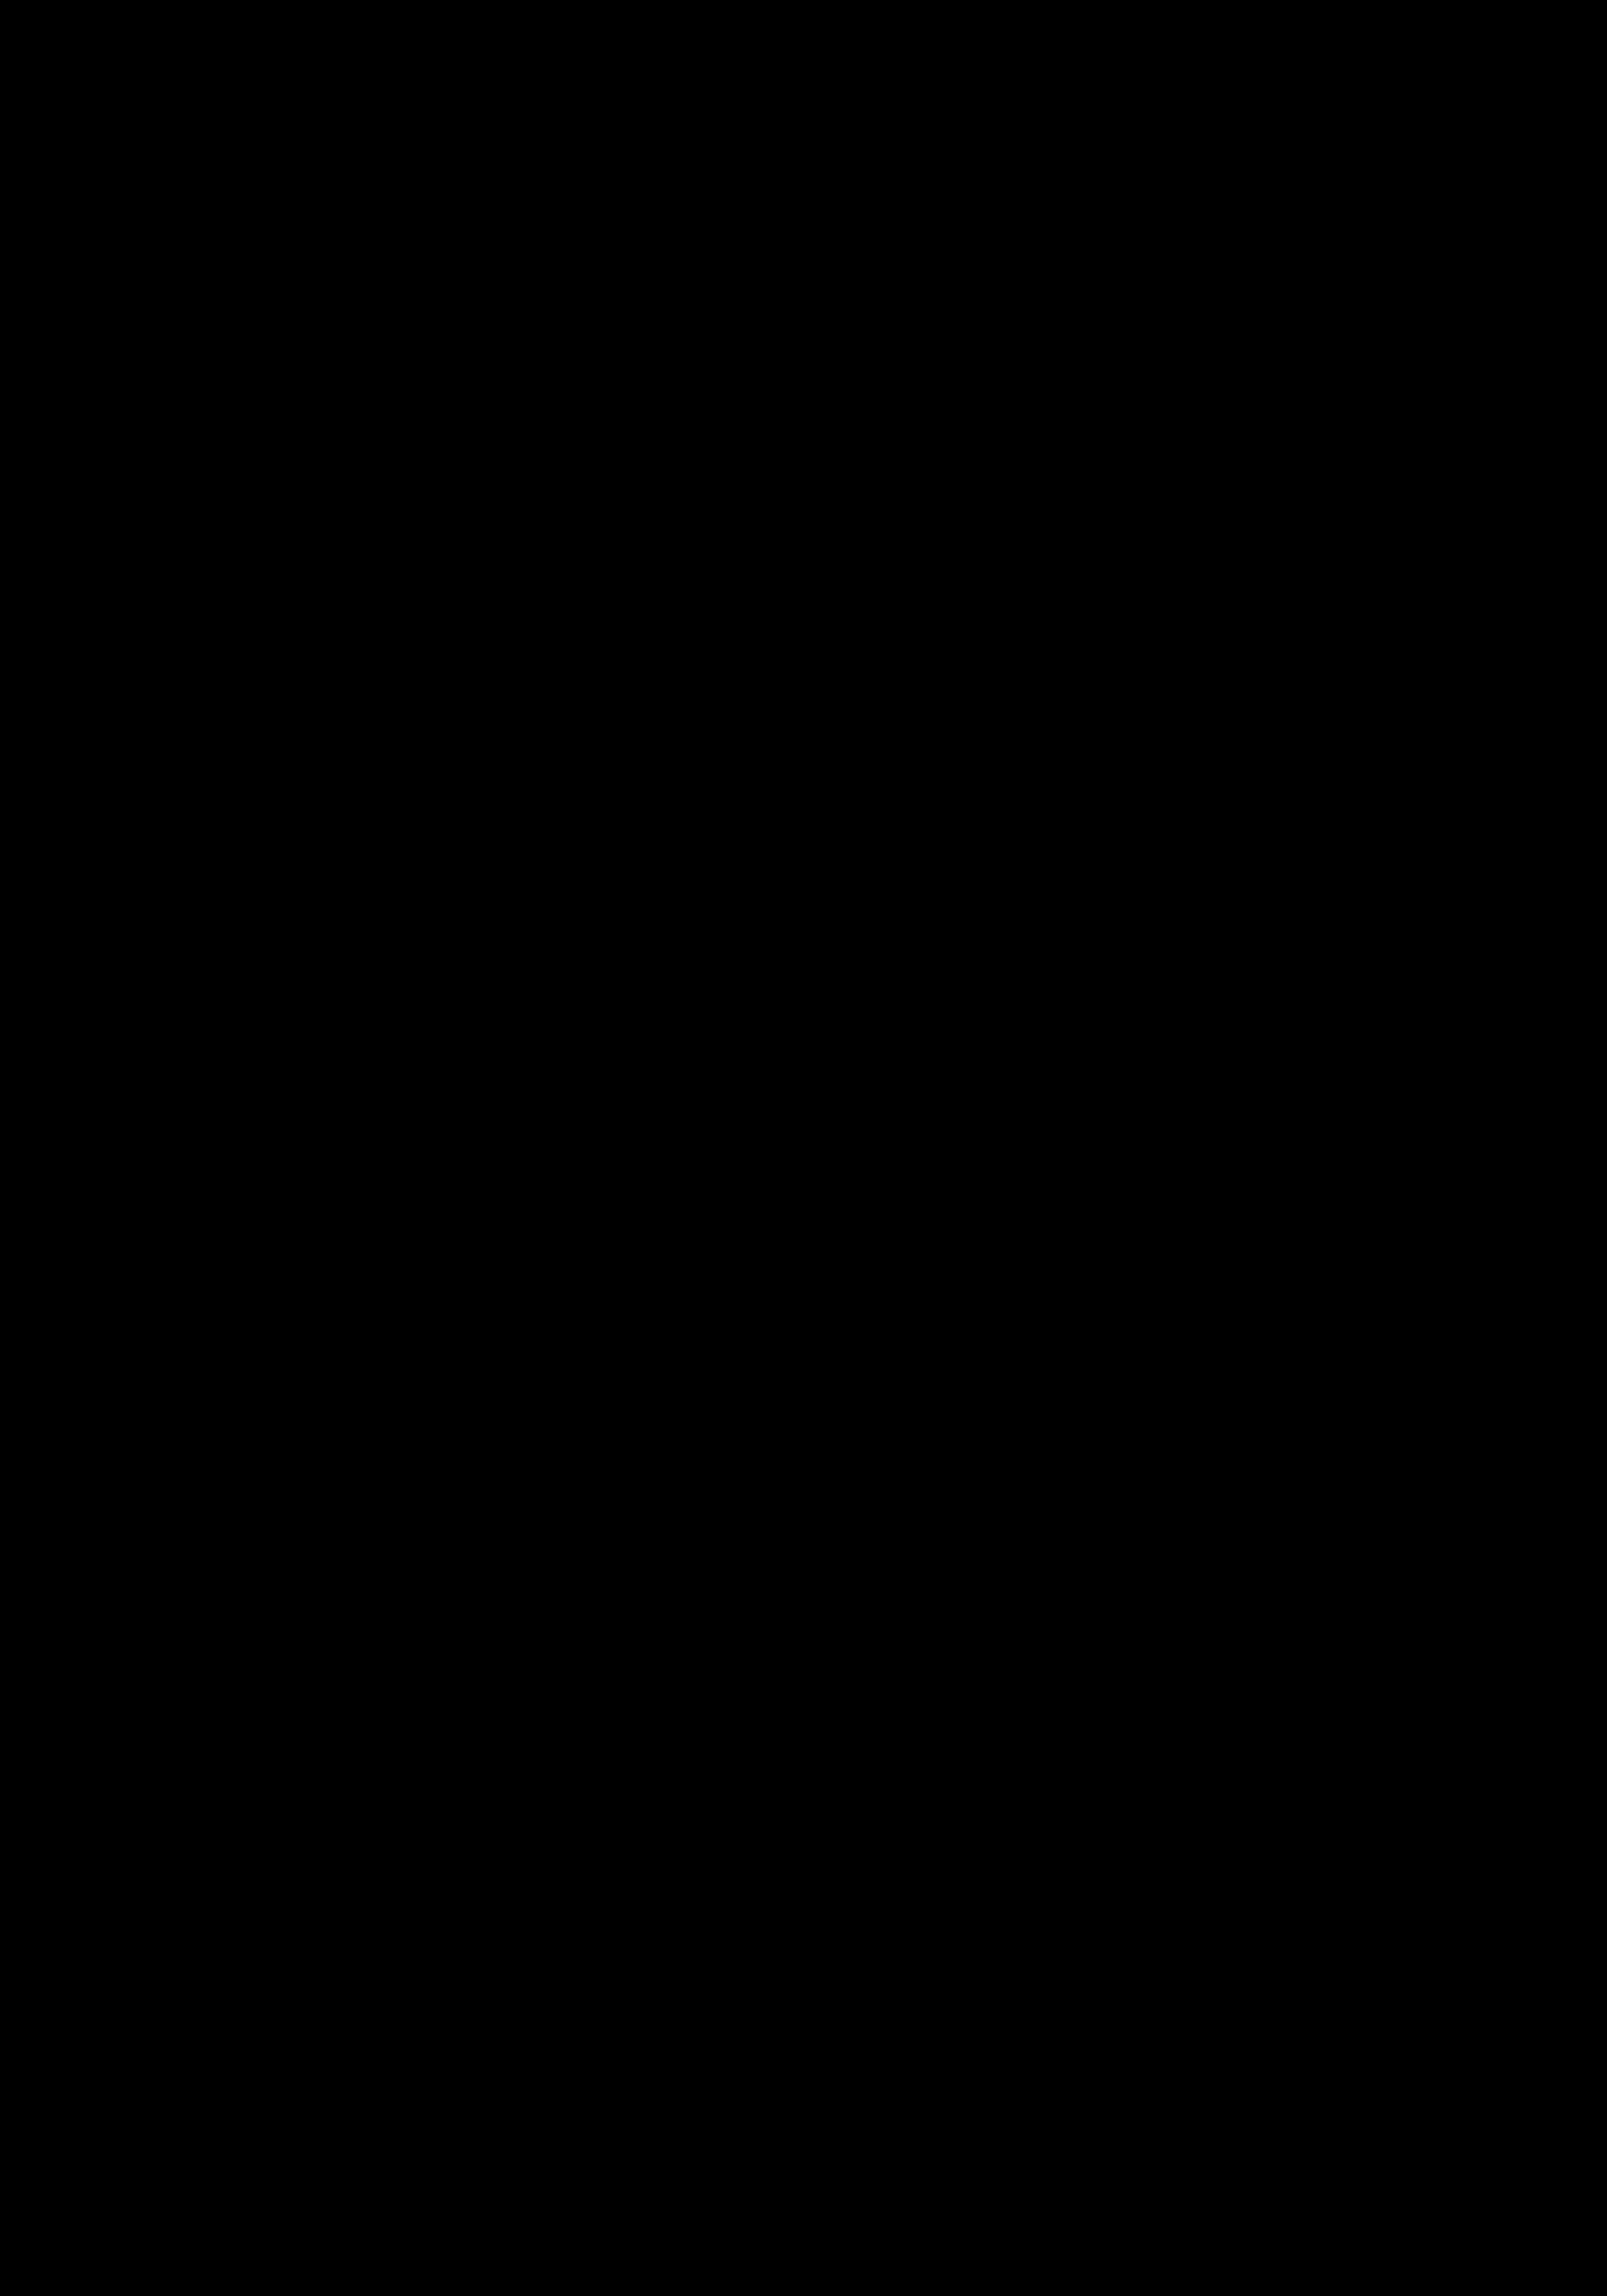 Hypno. Clipart tv line art